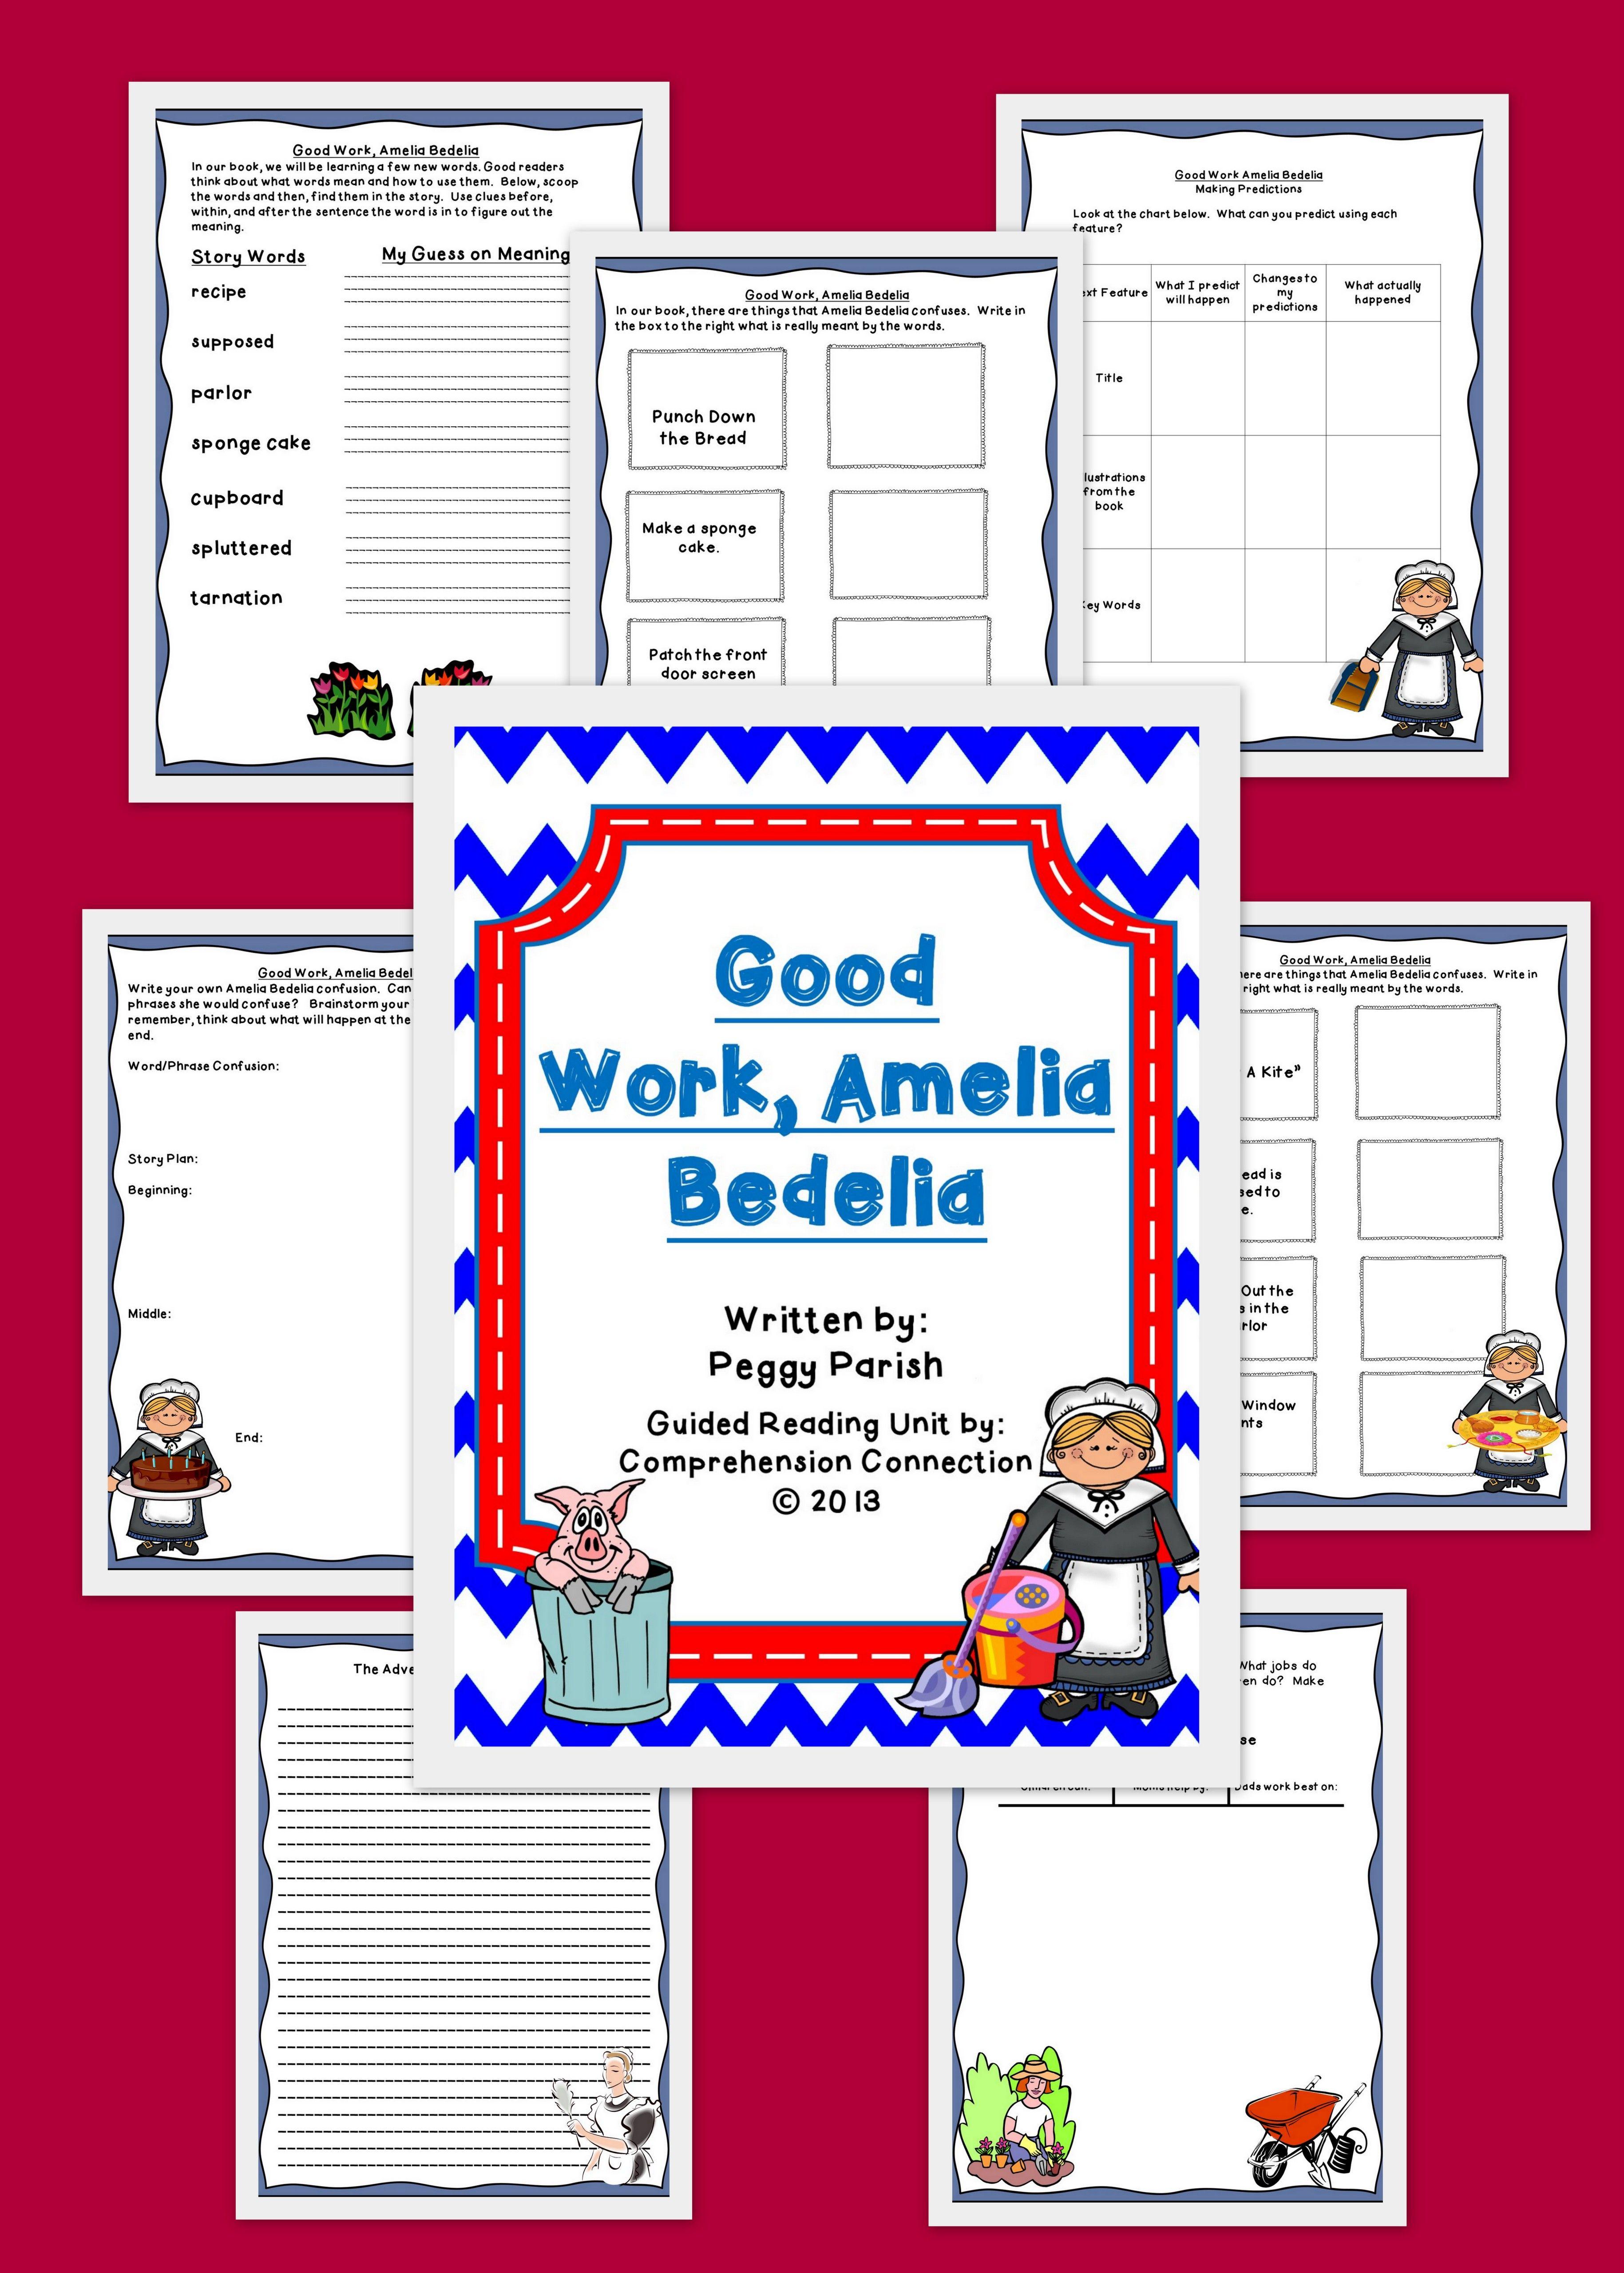 Good Work Amelia Bedelia Book Companion